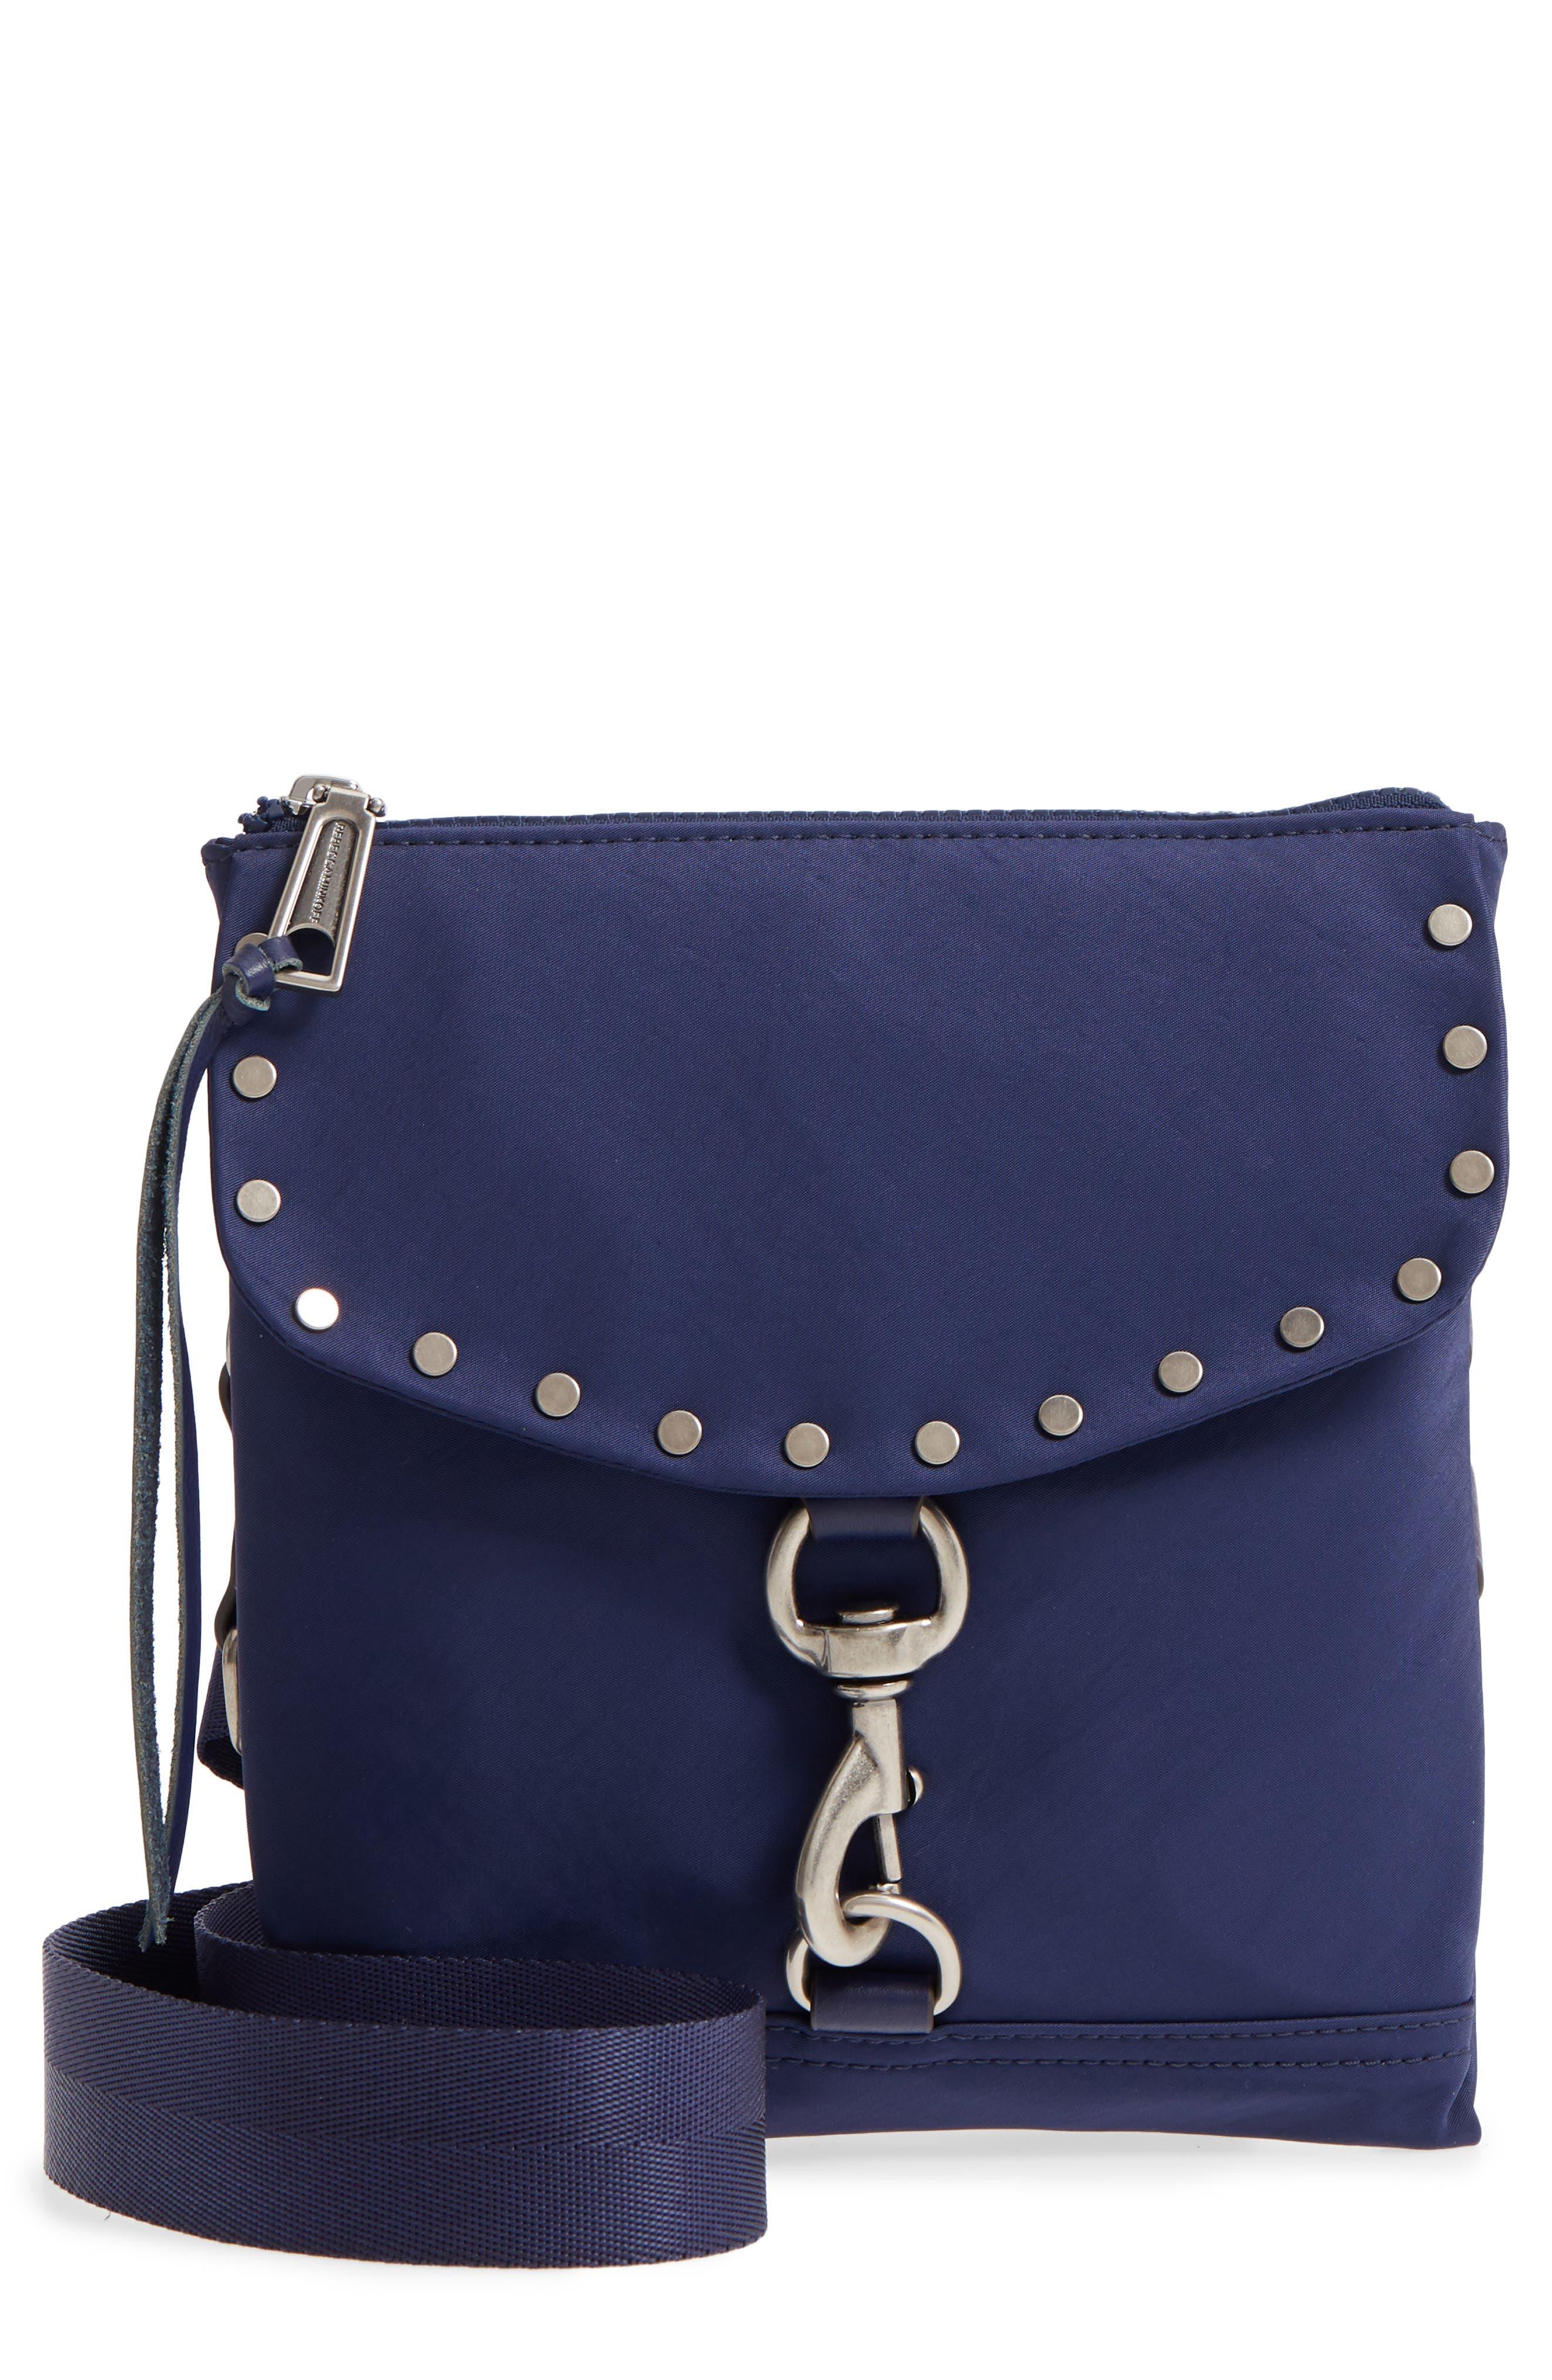 Nylon Flap Crossbody Bag,                             Main thumbnail 1, color,                             True Navy